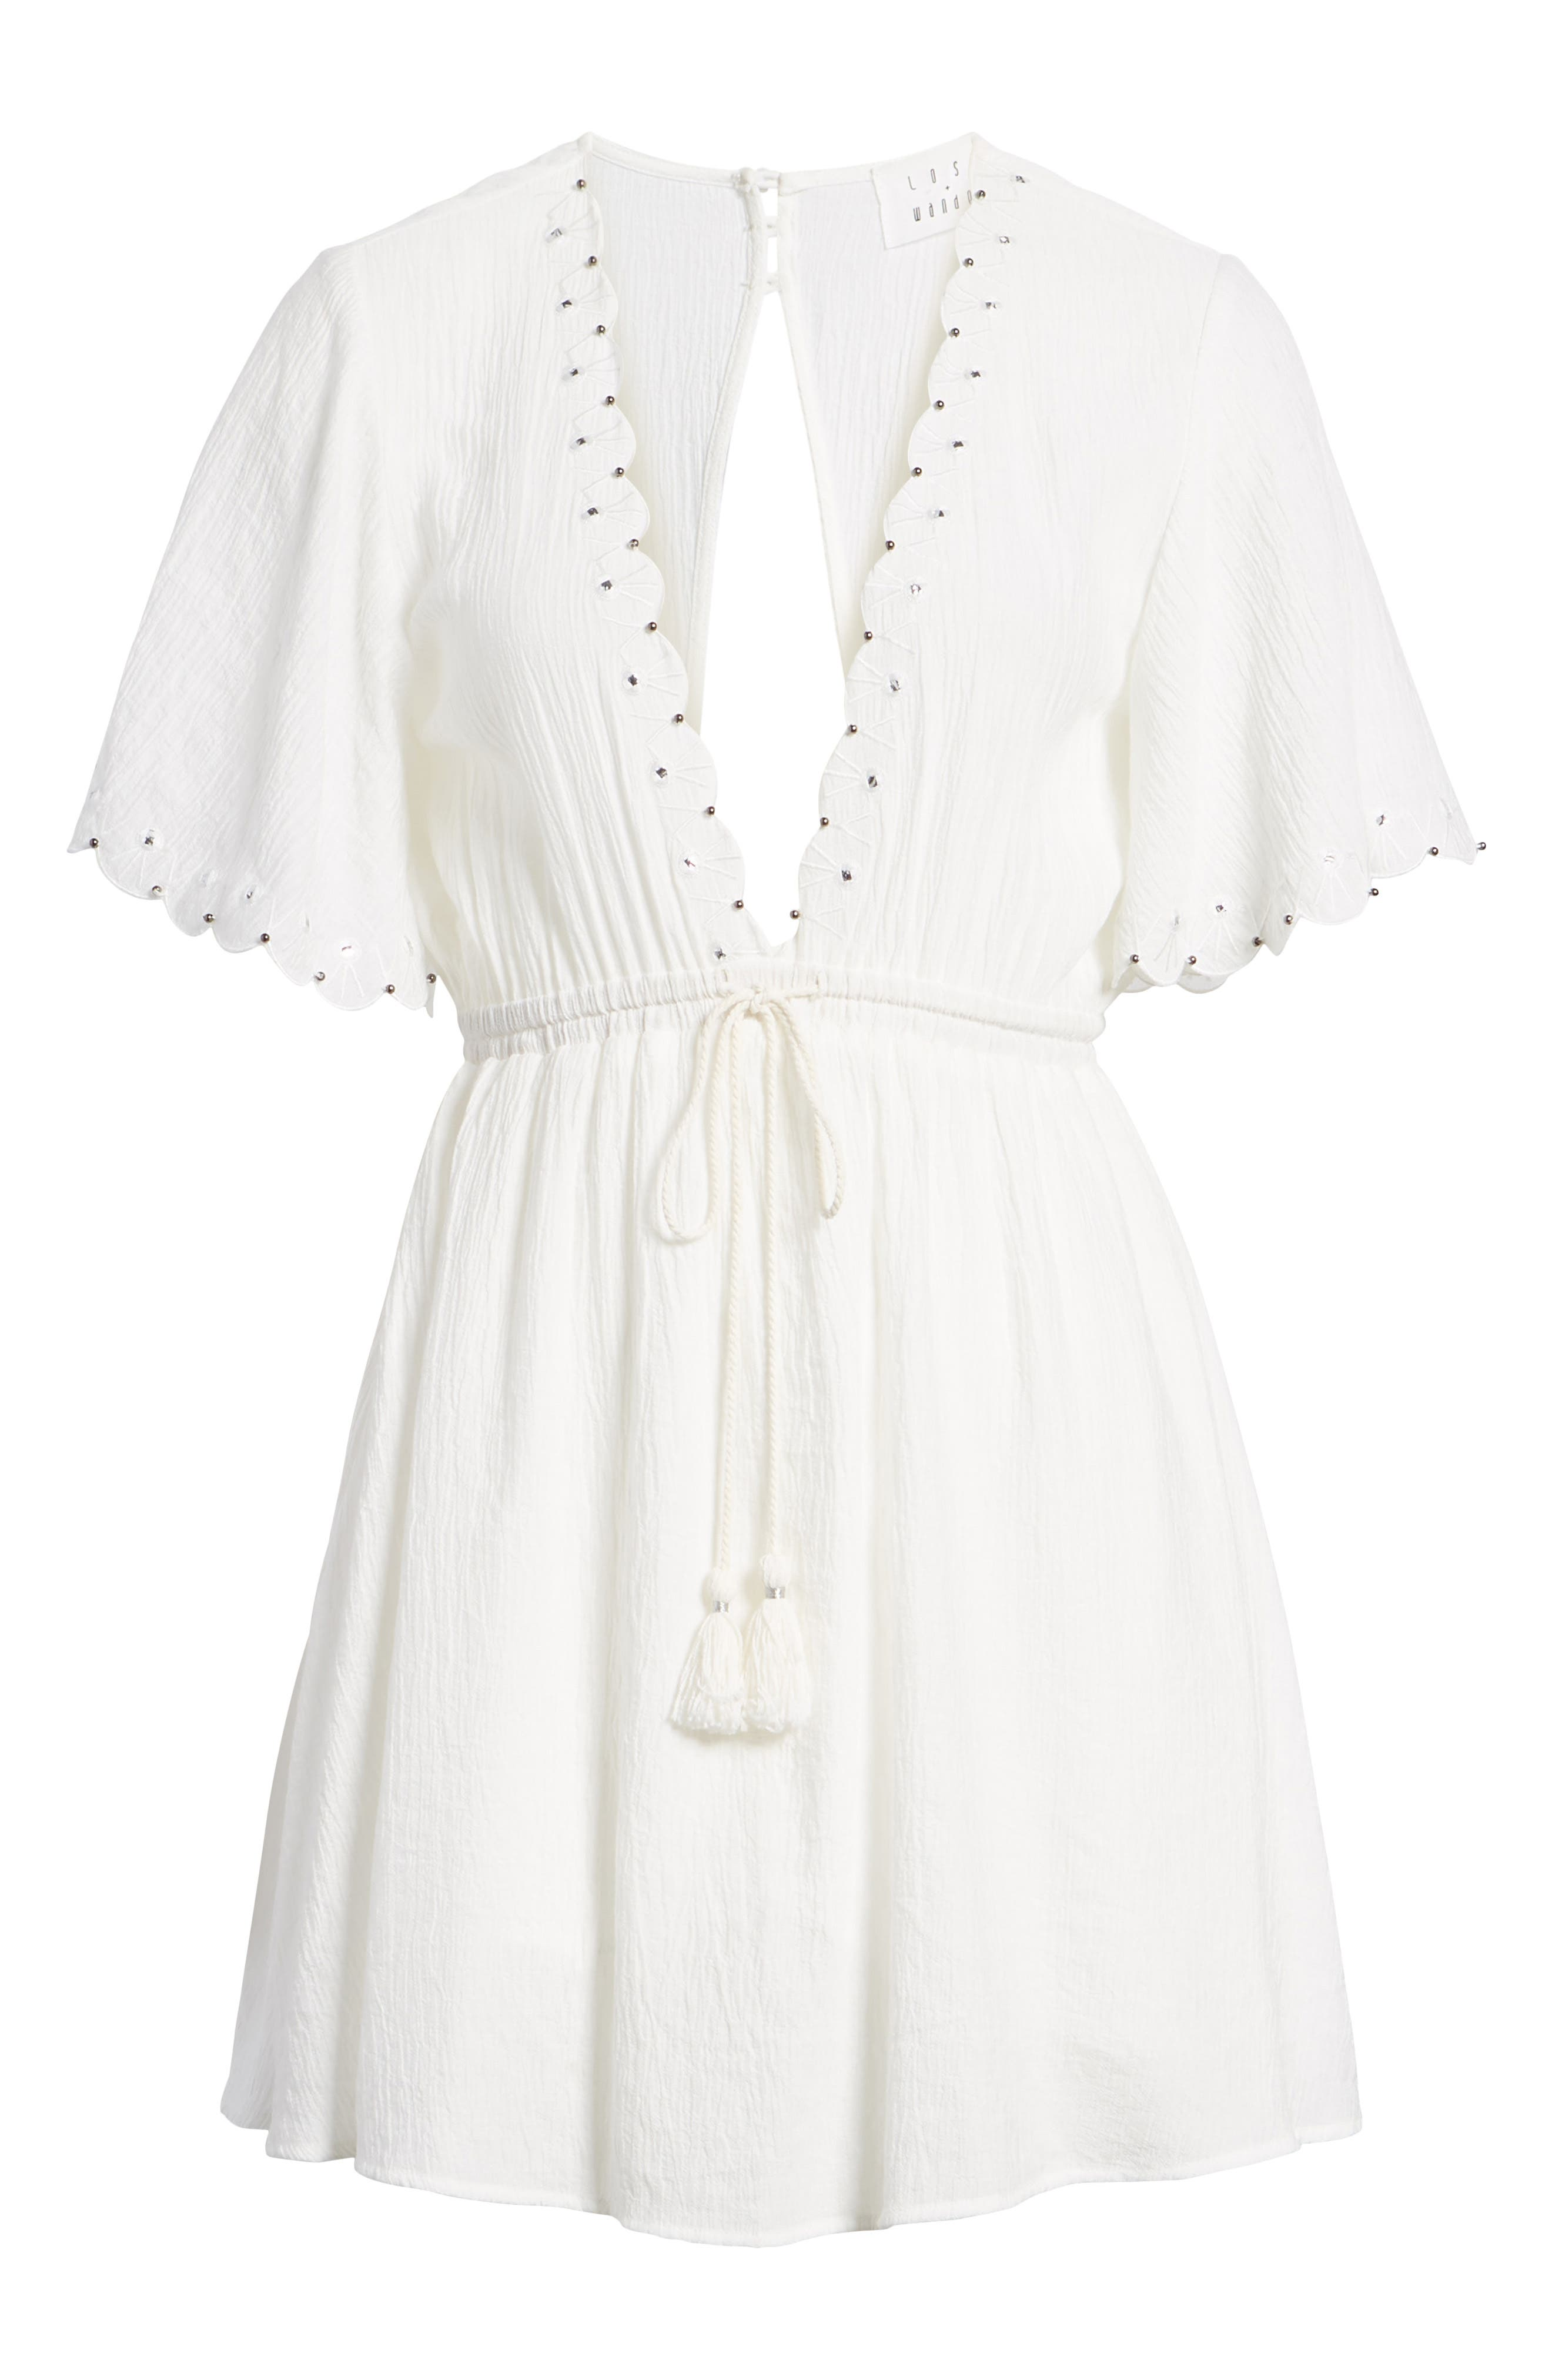 Magnolia Flutter Sleeve Dress,                             Alternate thumbnail 7, color,                             100